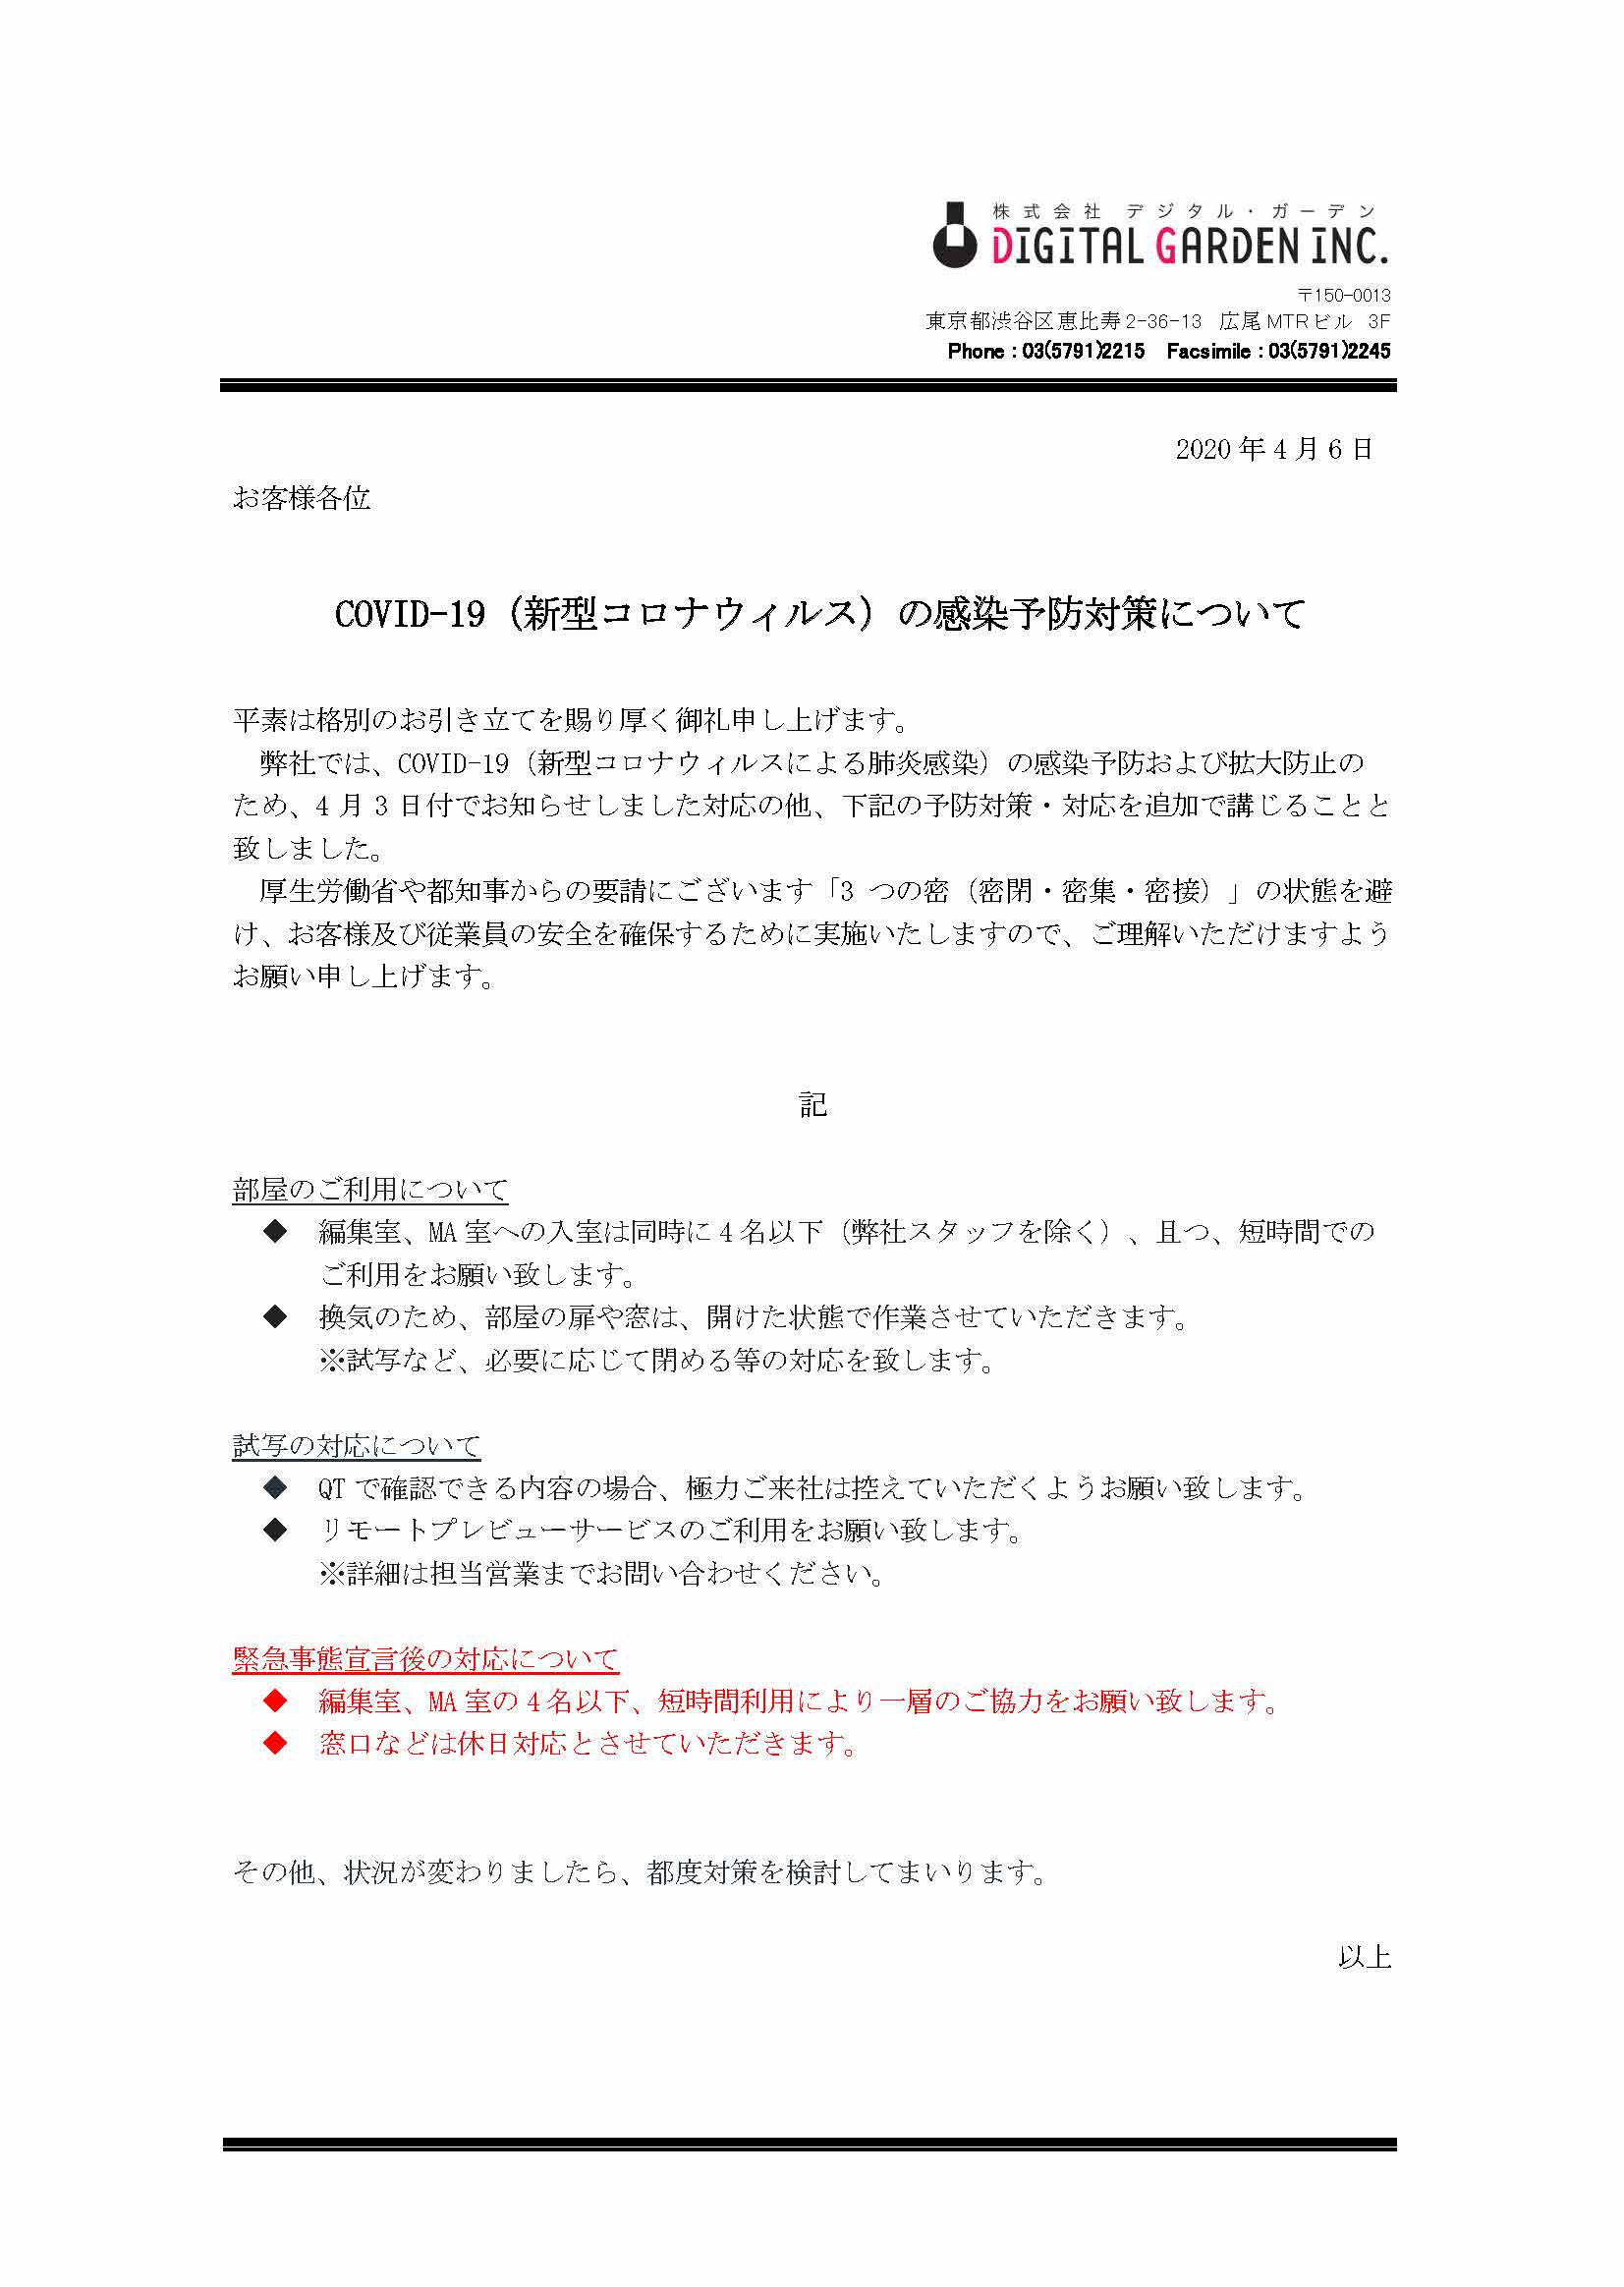 DGI_20200406コロナ対応のお知らせ